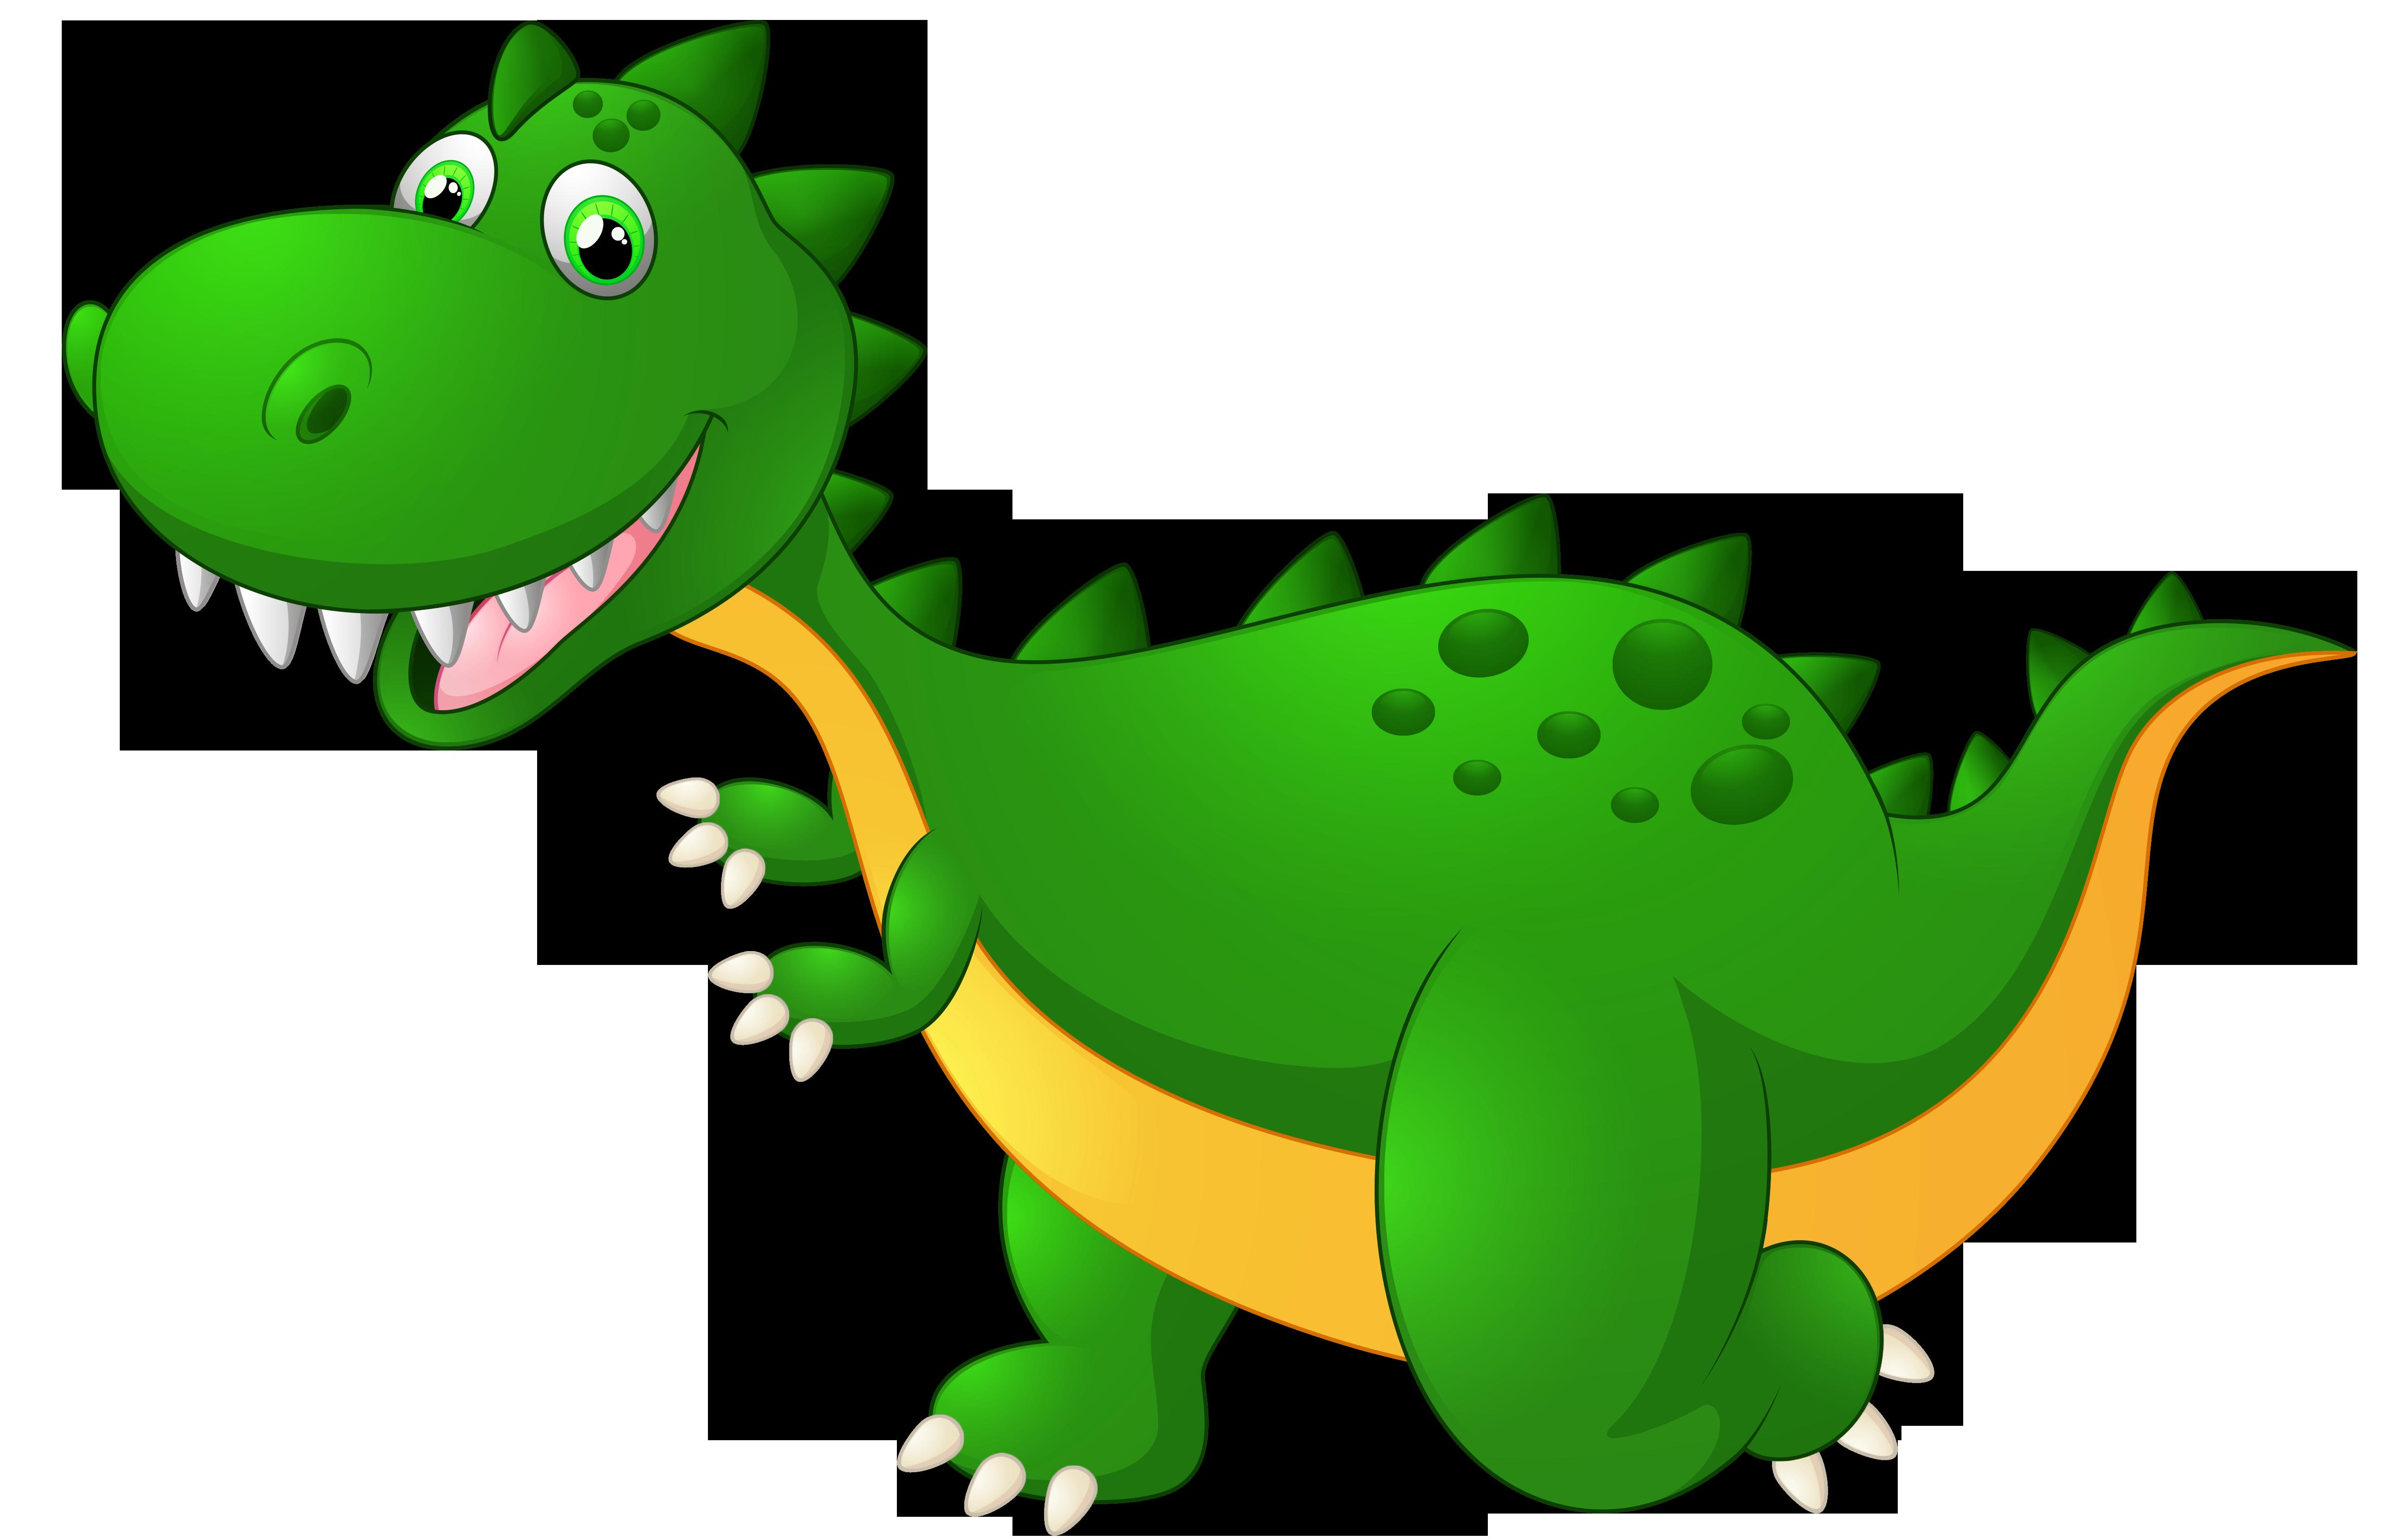 Dinosaur halloween clipart clip art transparent download Cute Dragon Cartoon PNG Clipart Image | Gallery Yopriceville - High ... clip art transparent download